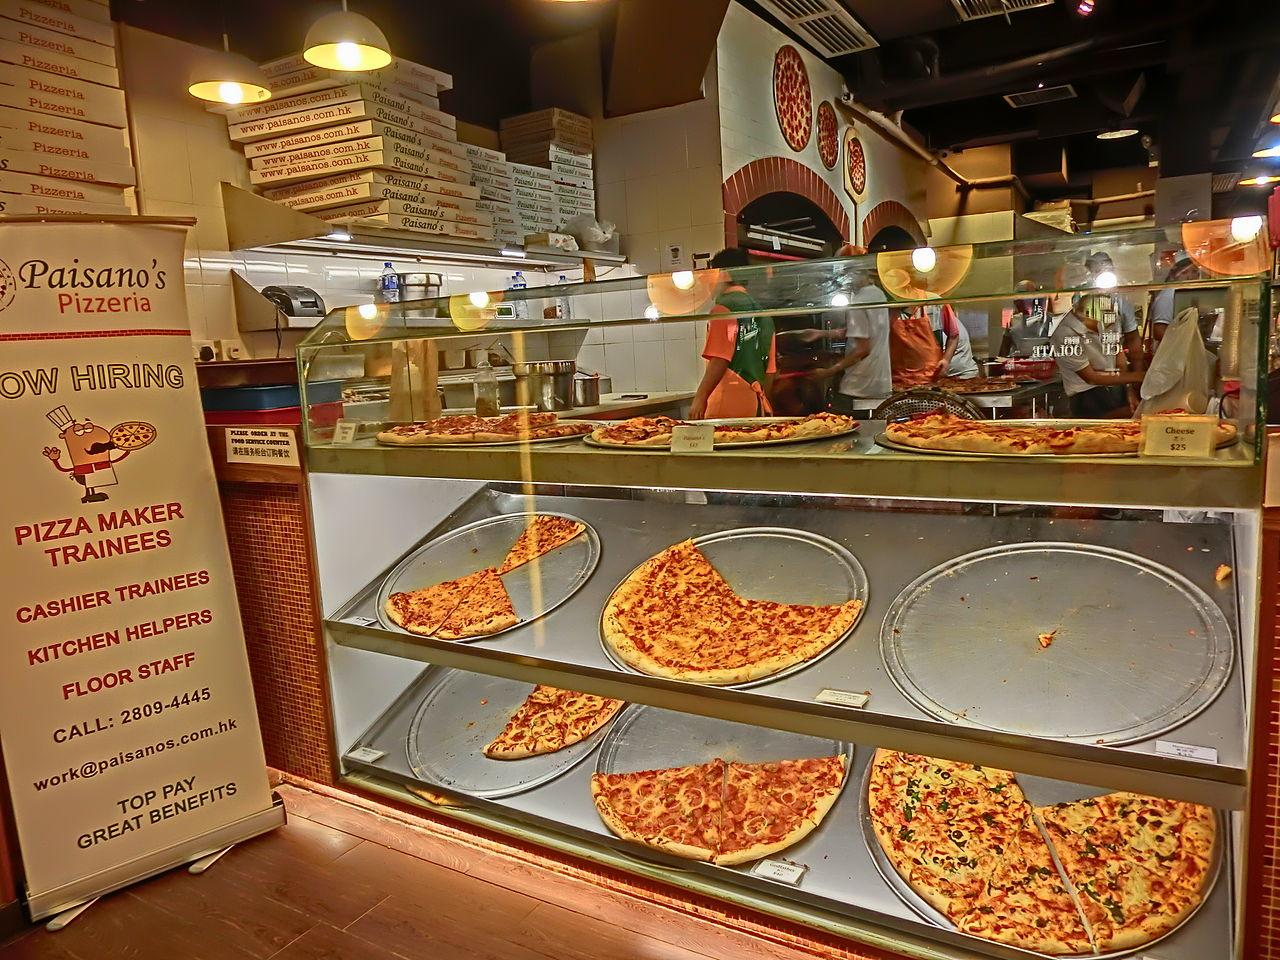 Paisano S Pizza Okeechobee Boulevard West Palm Beach Fl